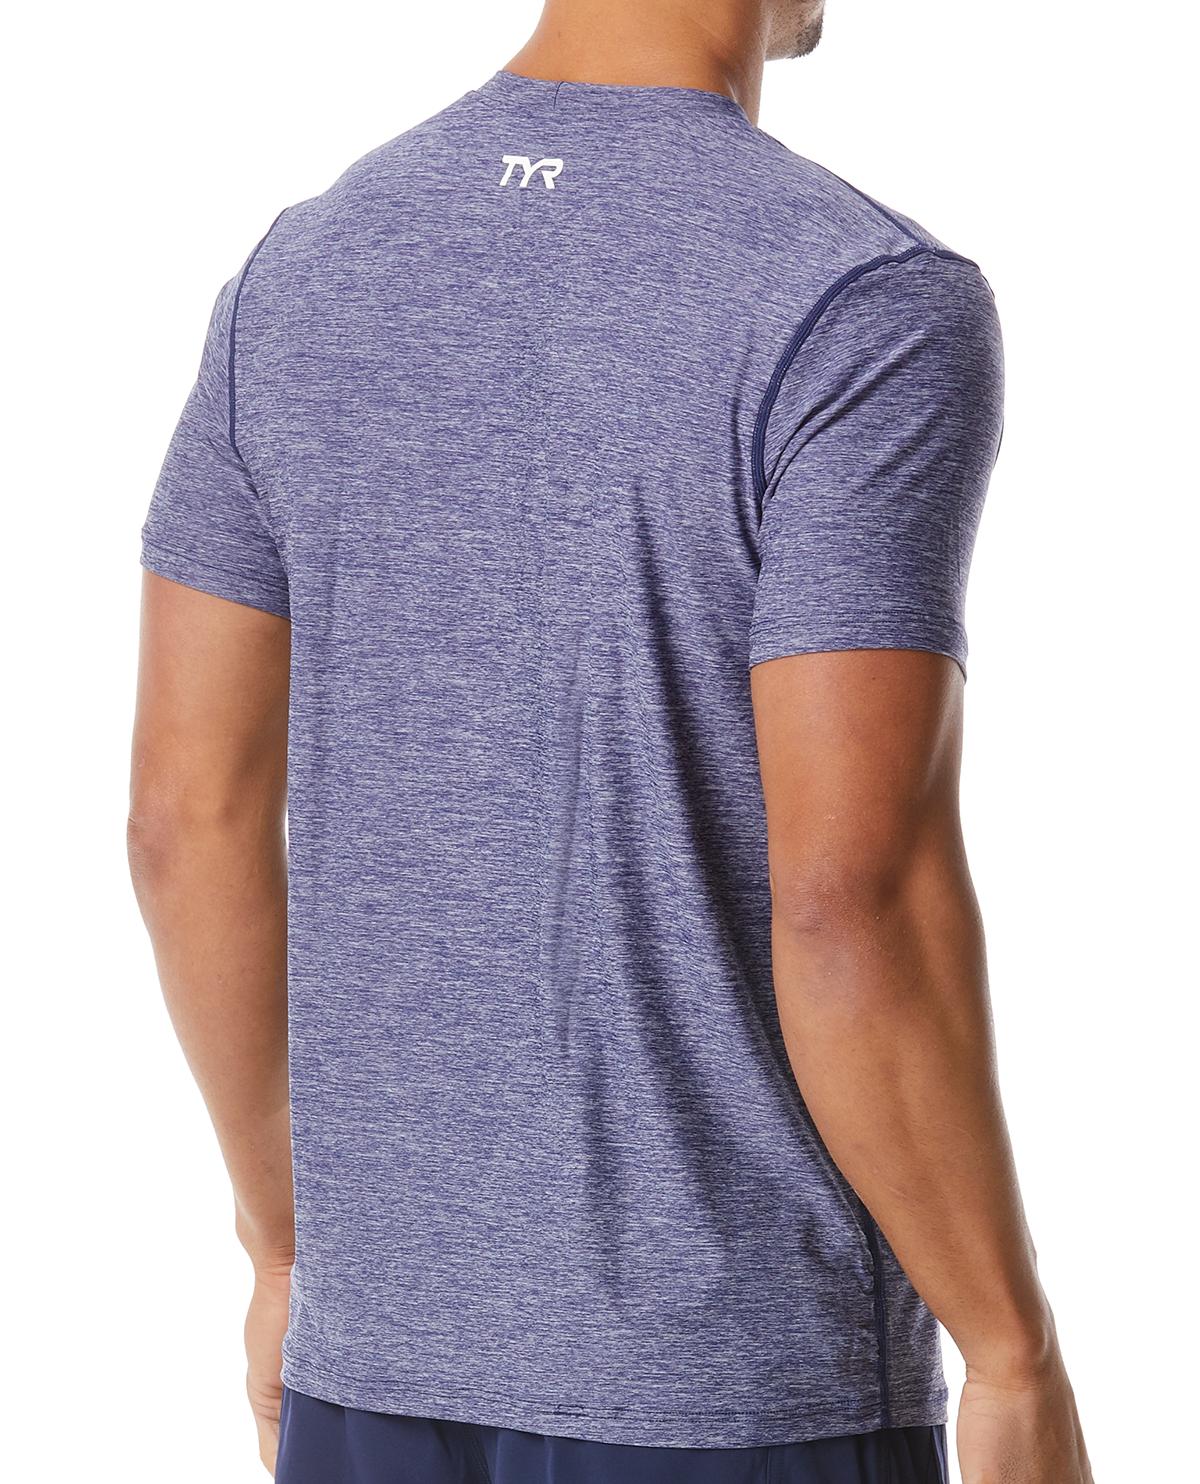 ... TYR Men s Vista Short Sleeve Rashguard ... 7661894946bf